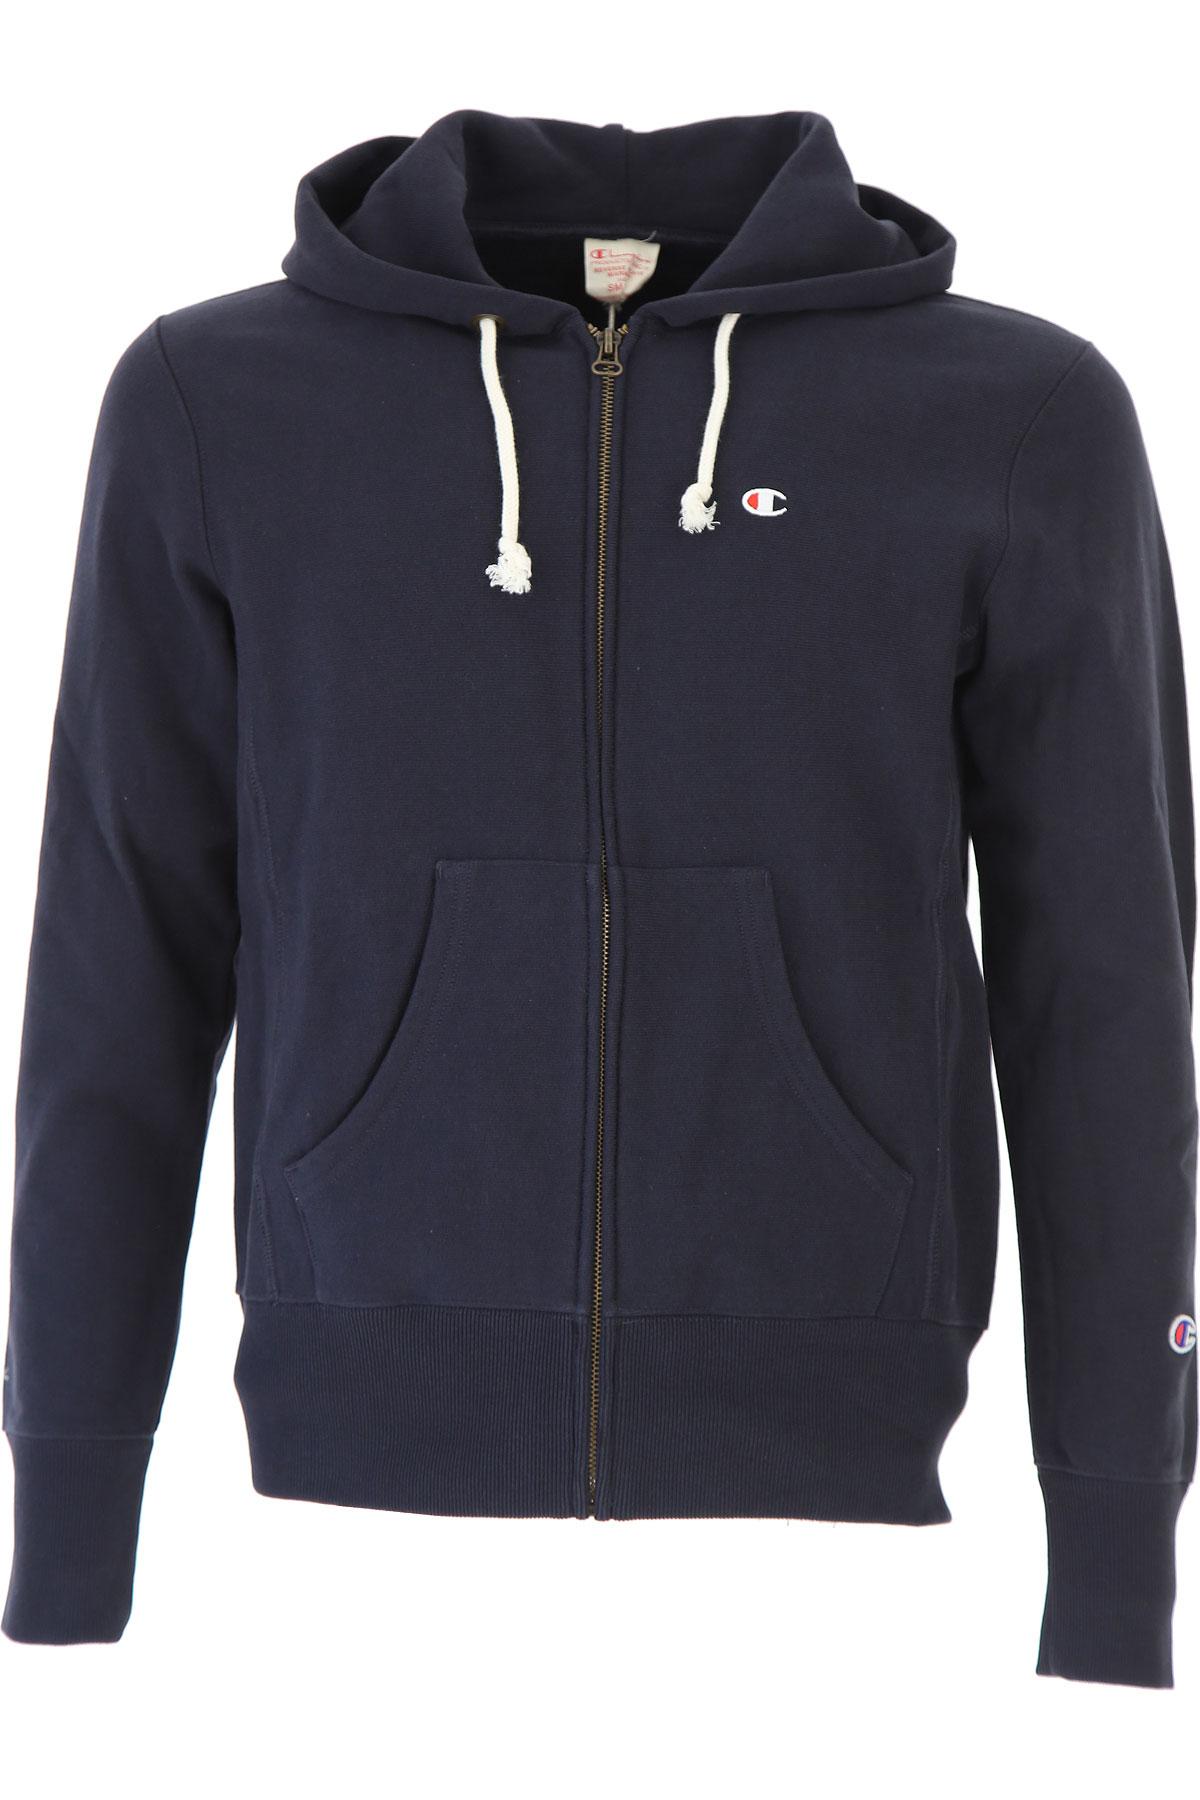 Champion Sweatshirt for Men On Sale, Navy Blue, Cotton, 2017, M S XL USA-460746